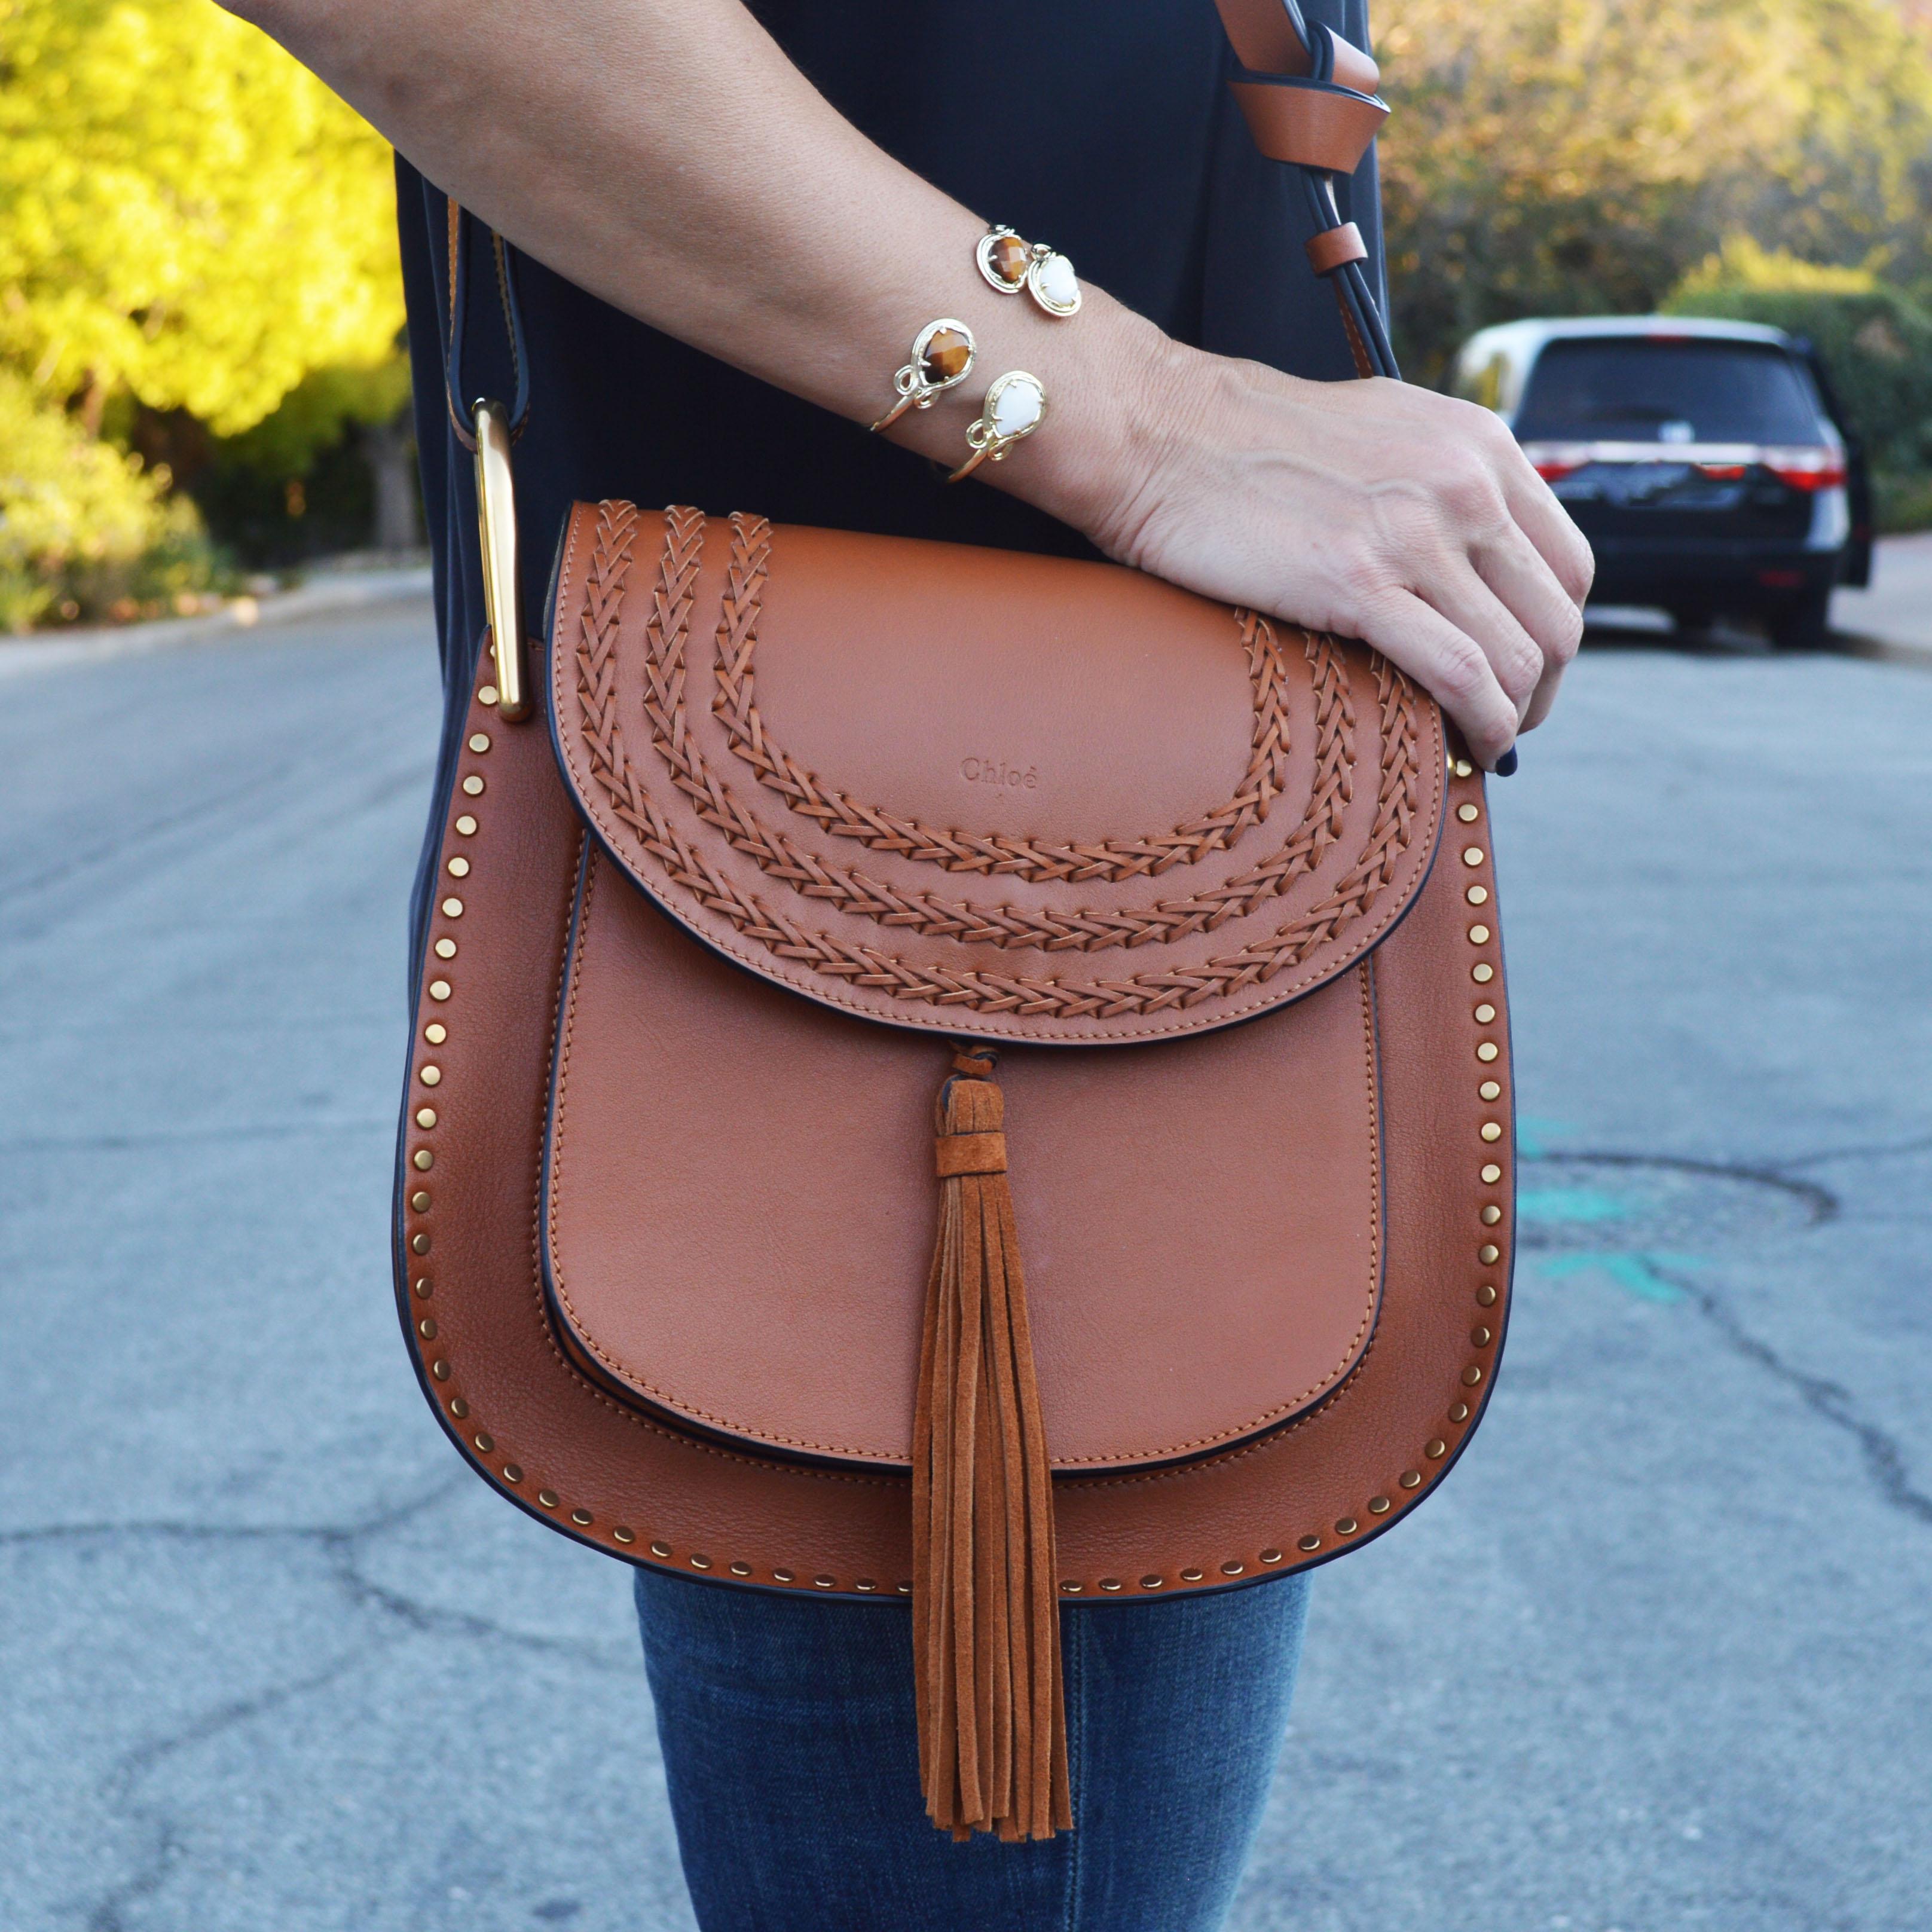 0c0cbfba52 medium chloe hudson in tan · tan chloe hudson review · chloe hudson  shoulder bag ...